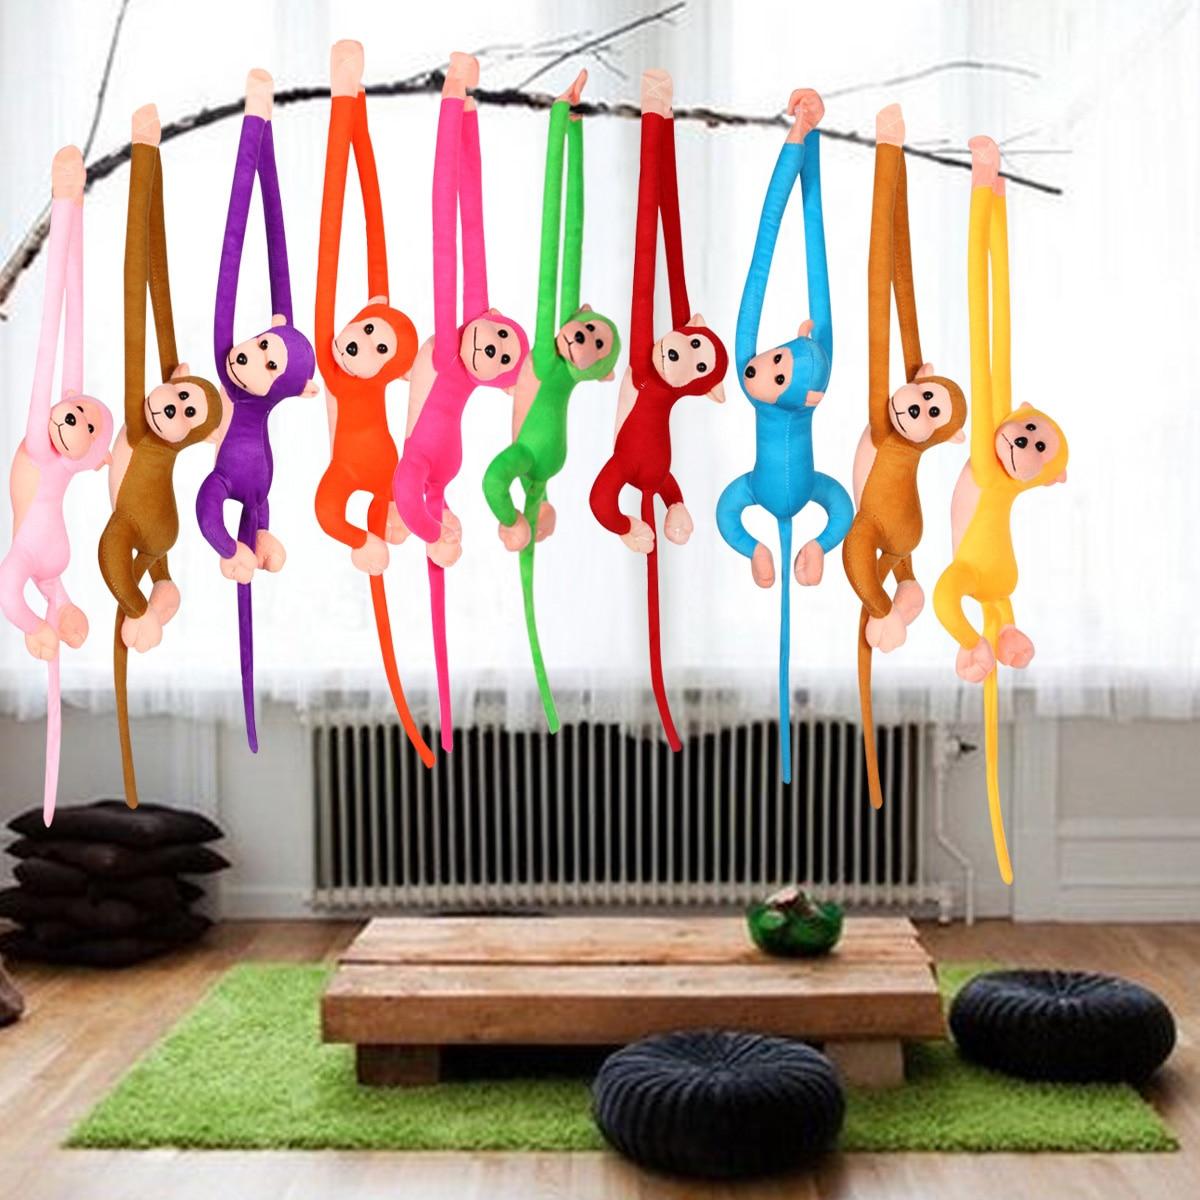 60cm Monkey from Arm to Tail Plush Colorful Monkey Long Arm Monkey Plush Dolls 10 Colors